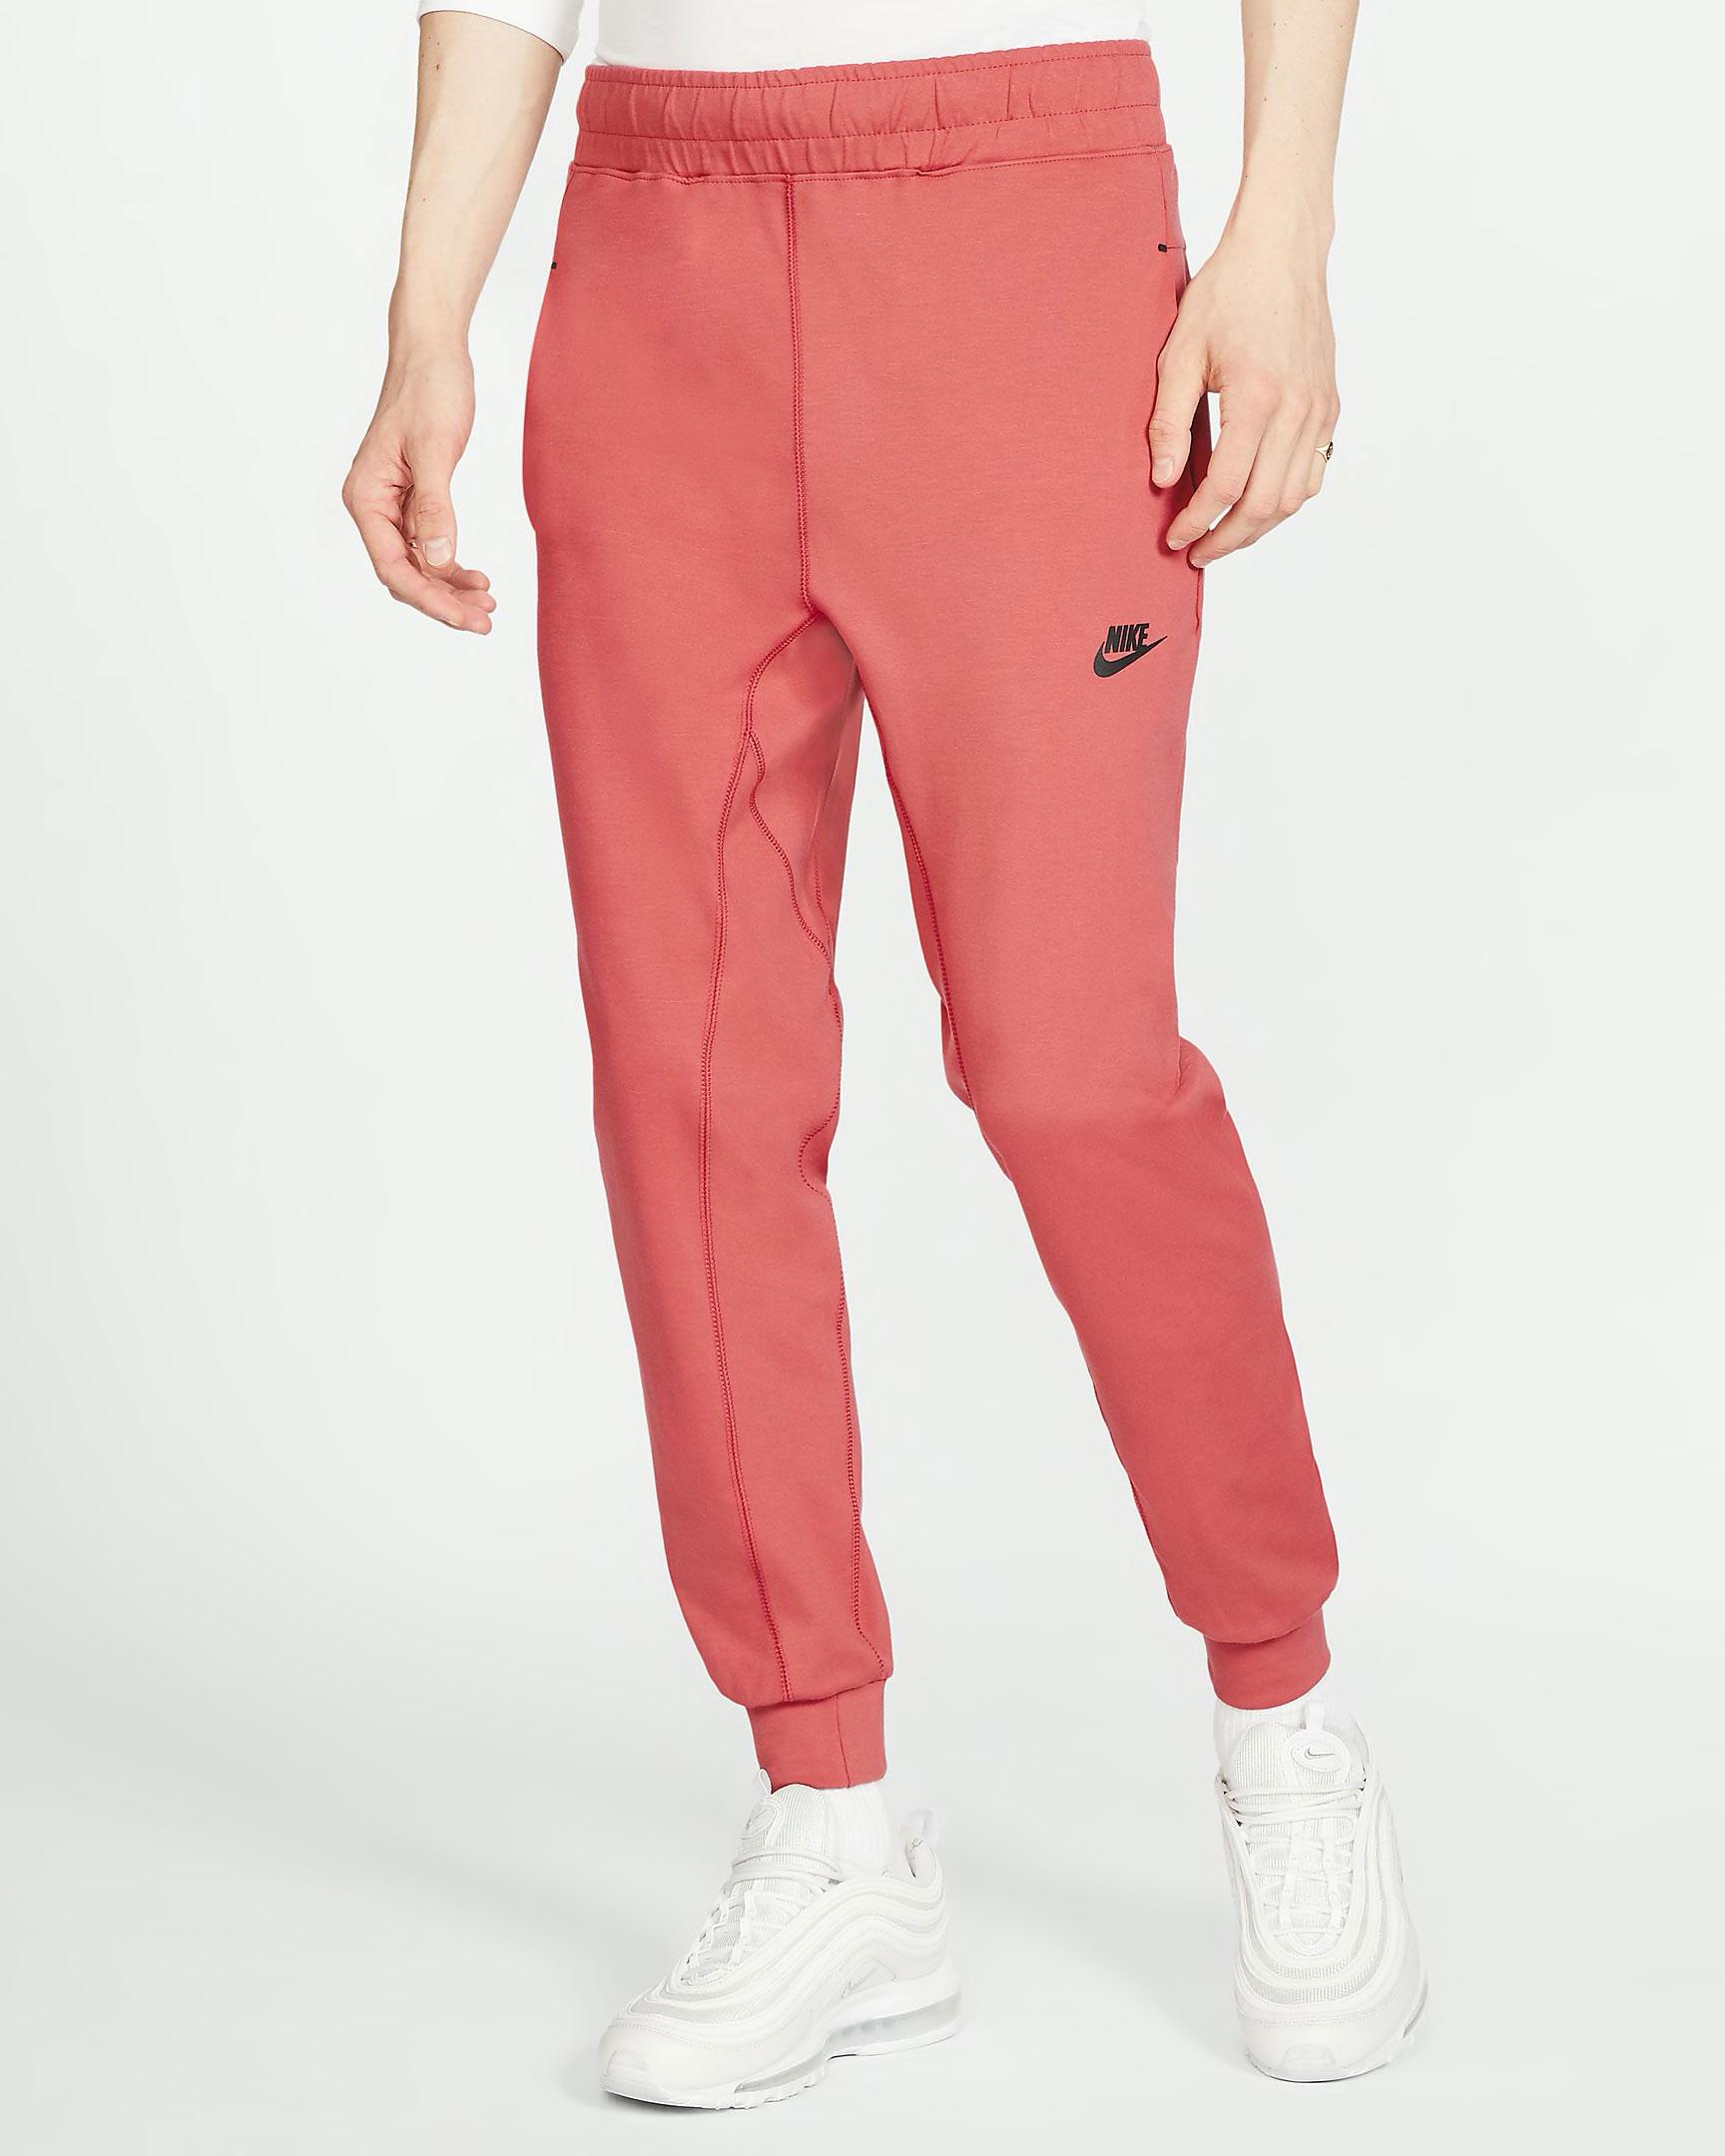 nike-infrared-jogger-pants